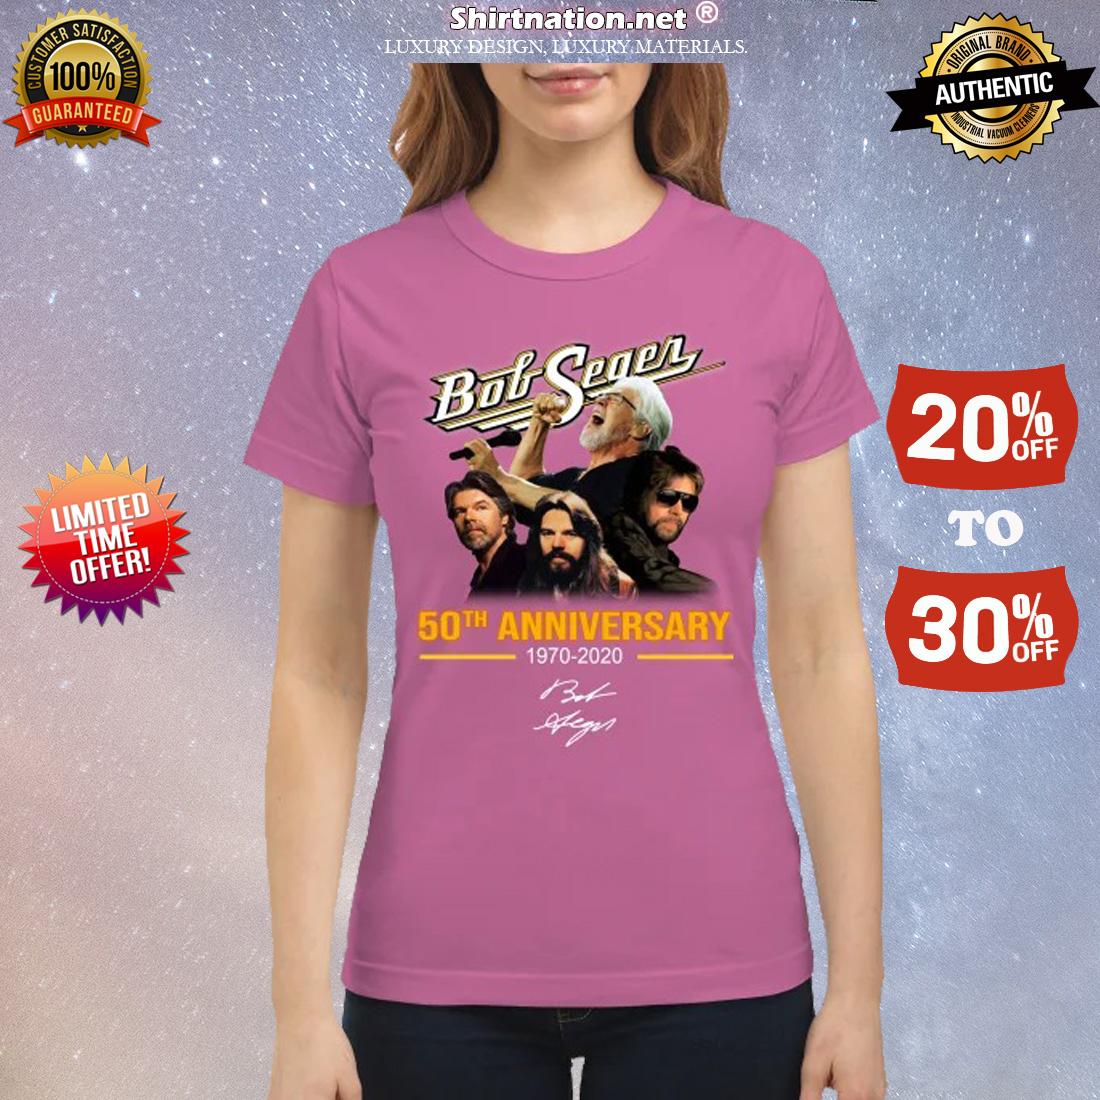 Bob Seger 50th anniversary 1970 2020 classic shirt